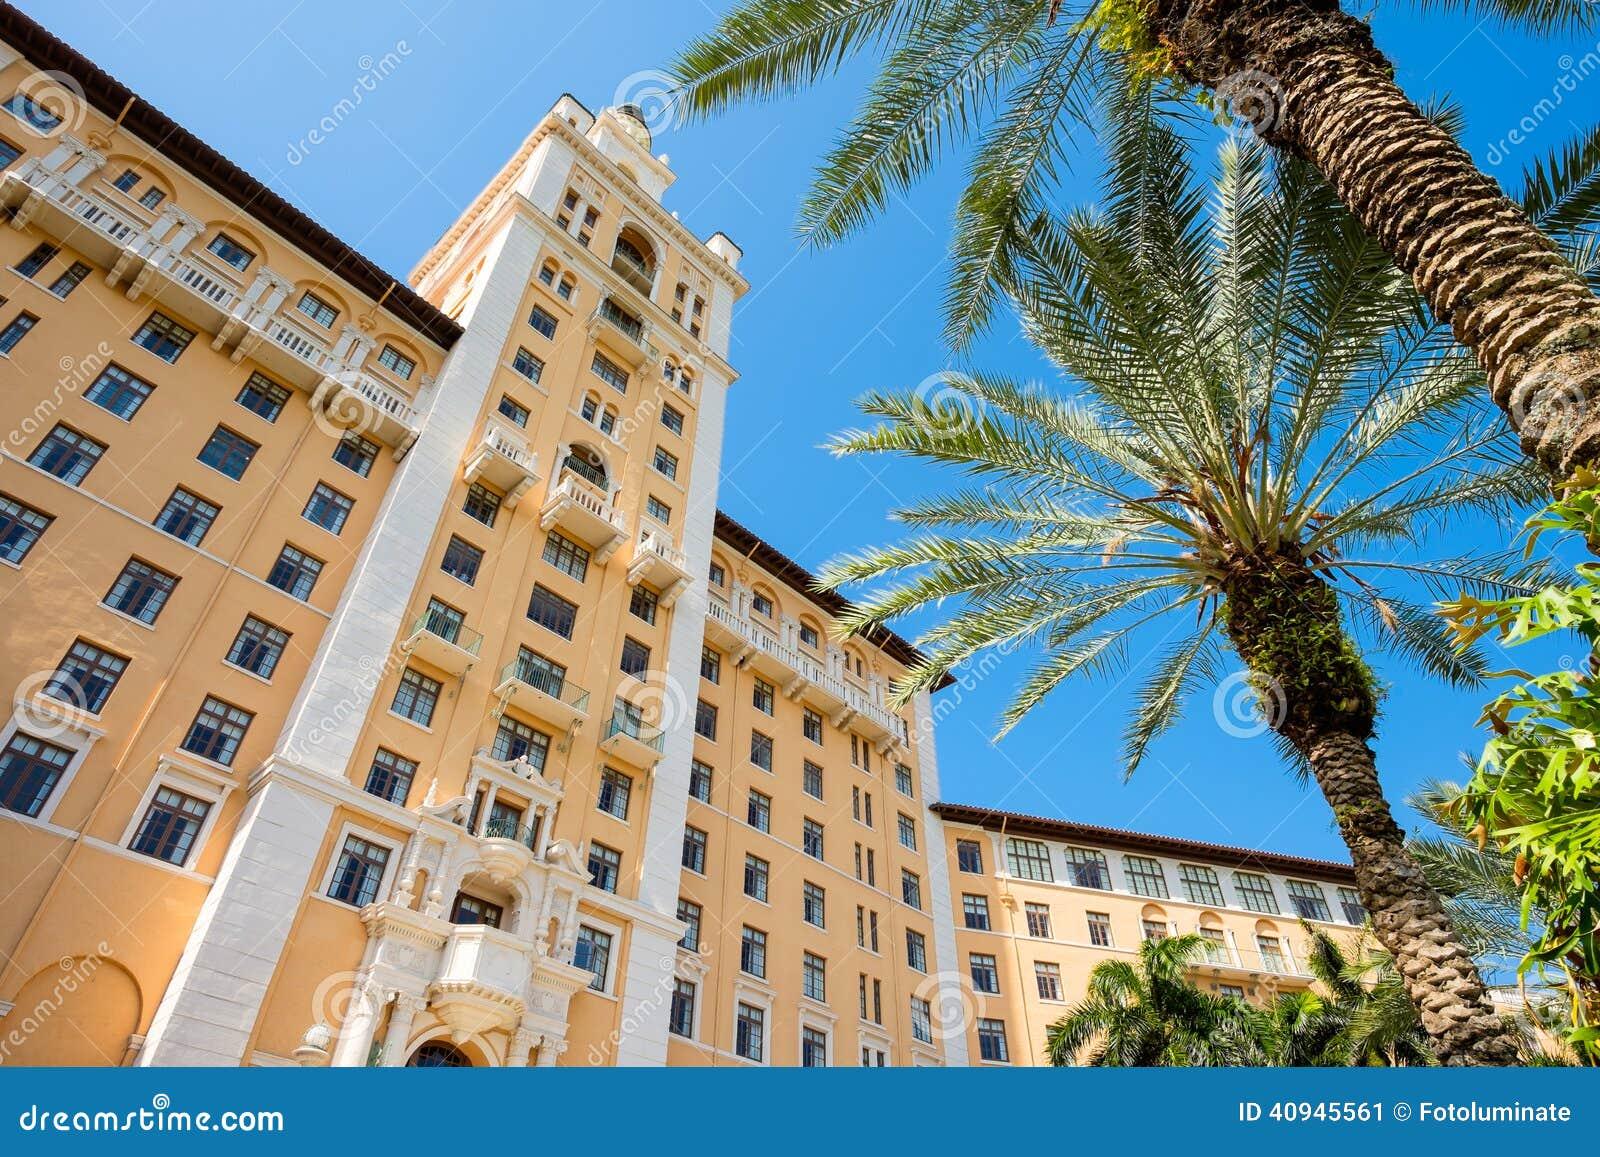 The Biltmore Hotel Coral Gables Miami Florida Usa